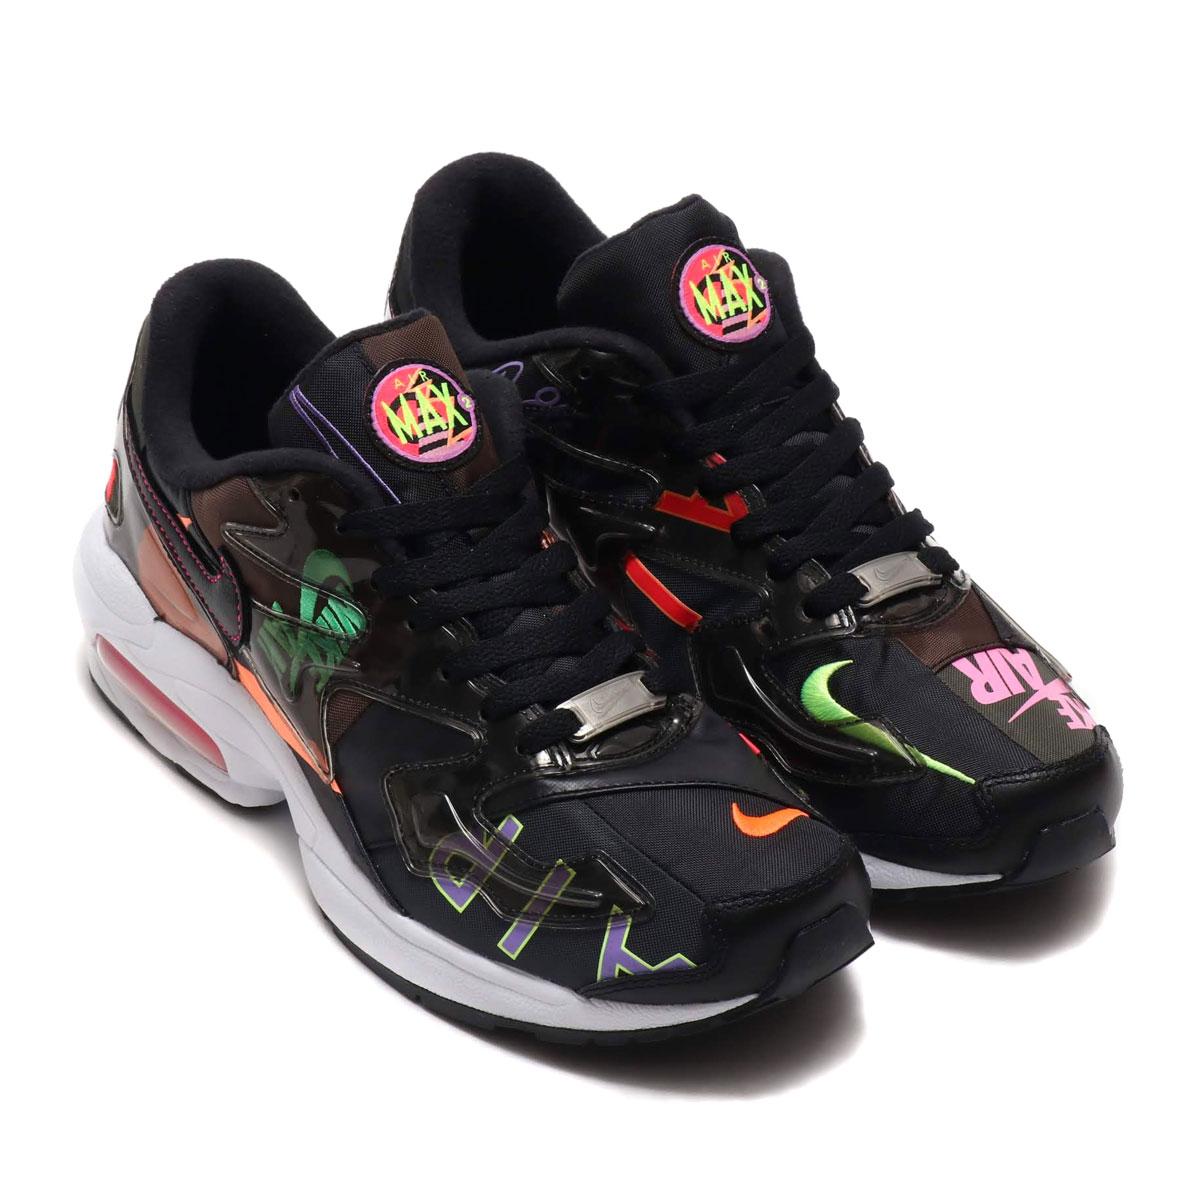 f:id:sneakerscaffetokyo:20190610175941j:plain